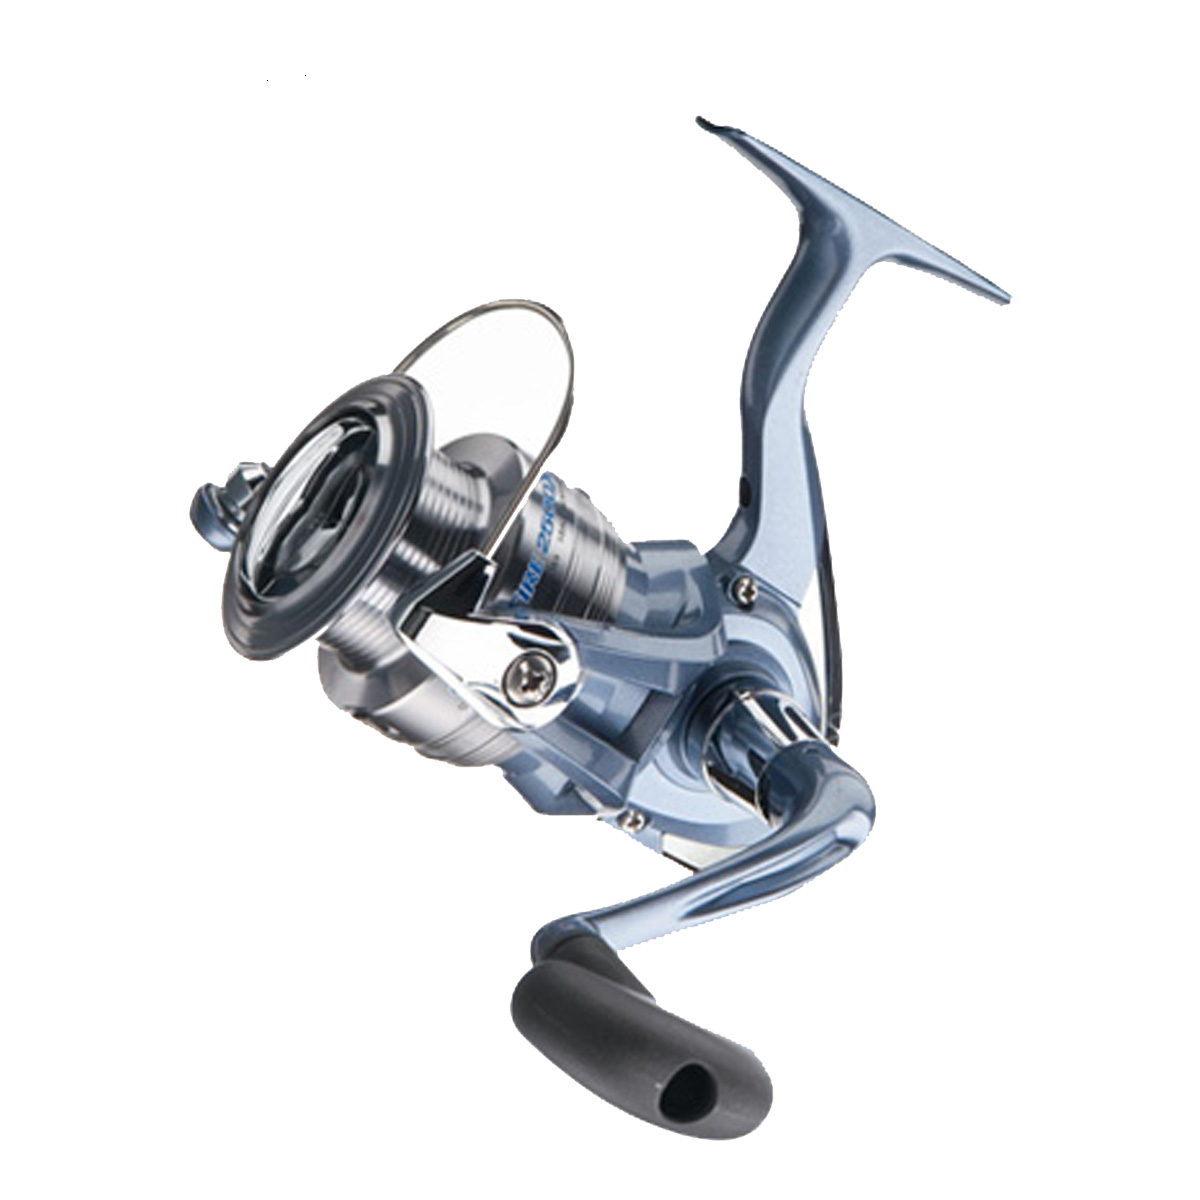 Molinete Daiwa Crossfire X  - Pró Pesca Shop